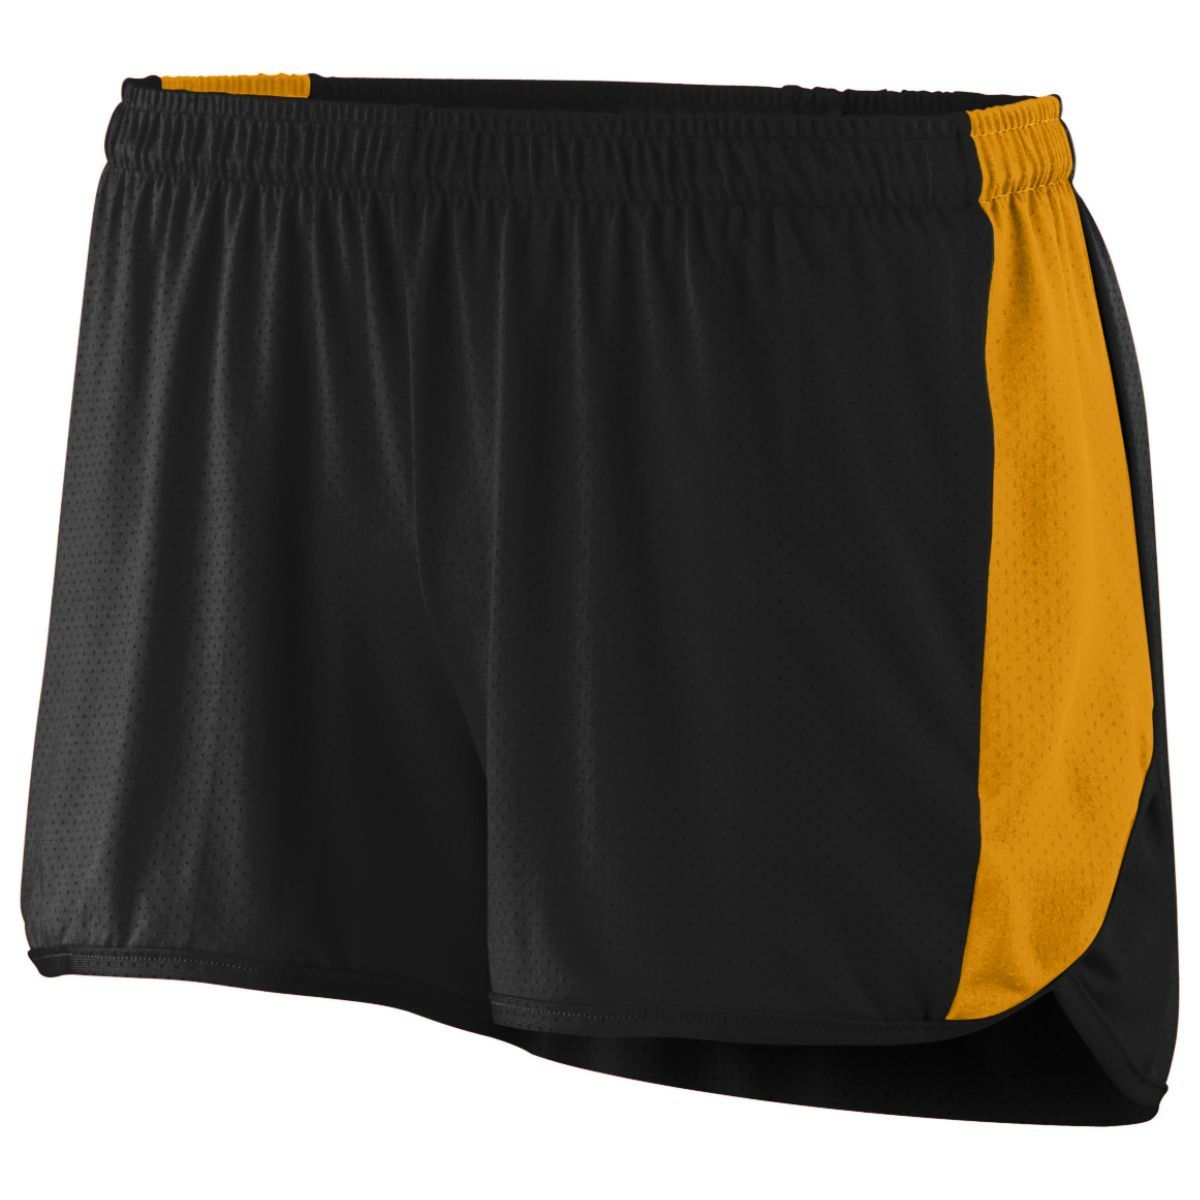 Ladies Sprint Shorts - BLACK/GOLD